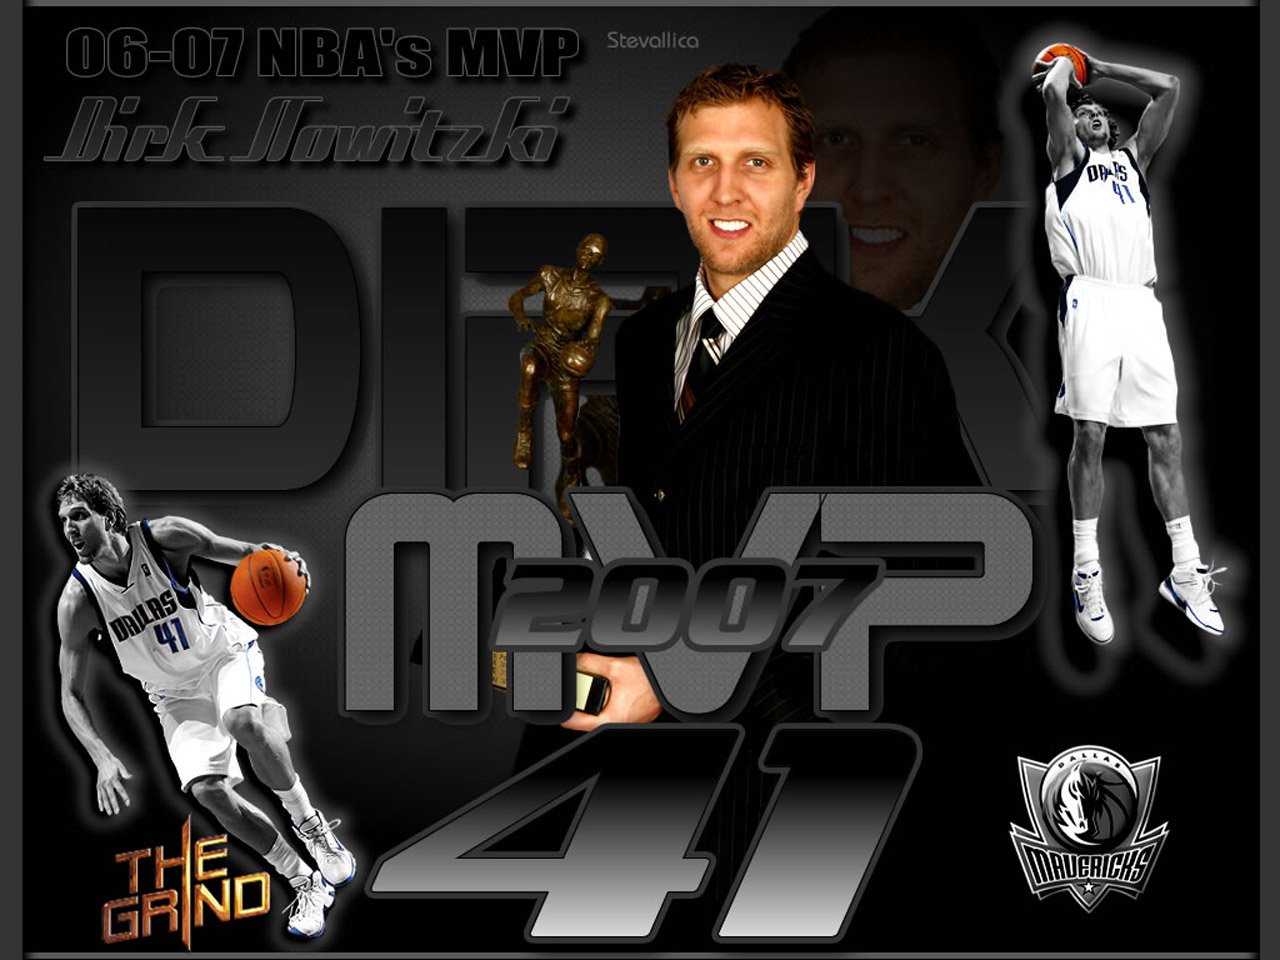 http://4.bp.blogspot.com/_Wg6aUKXC6KY/TPIppzufYPI/AAAAAAAACeY/dGcoAgTVu6k/s1600/Dirk-Nowitzki-2007-MVP-Wallpaper.jpg